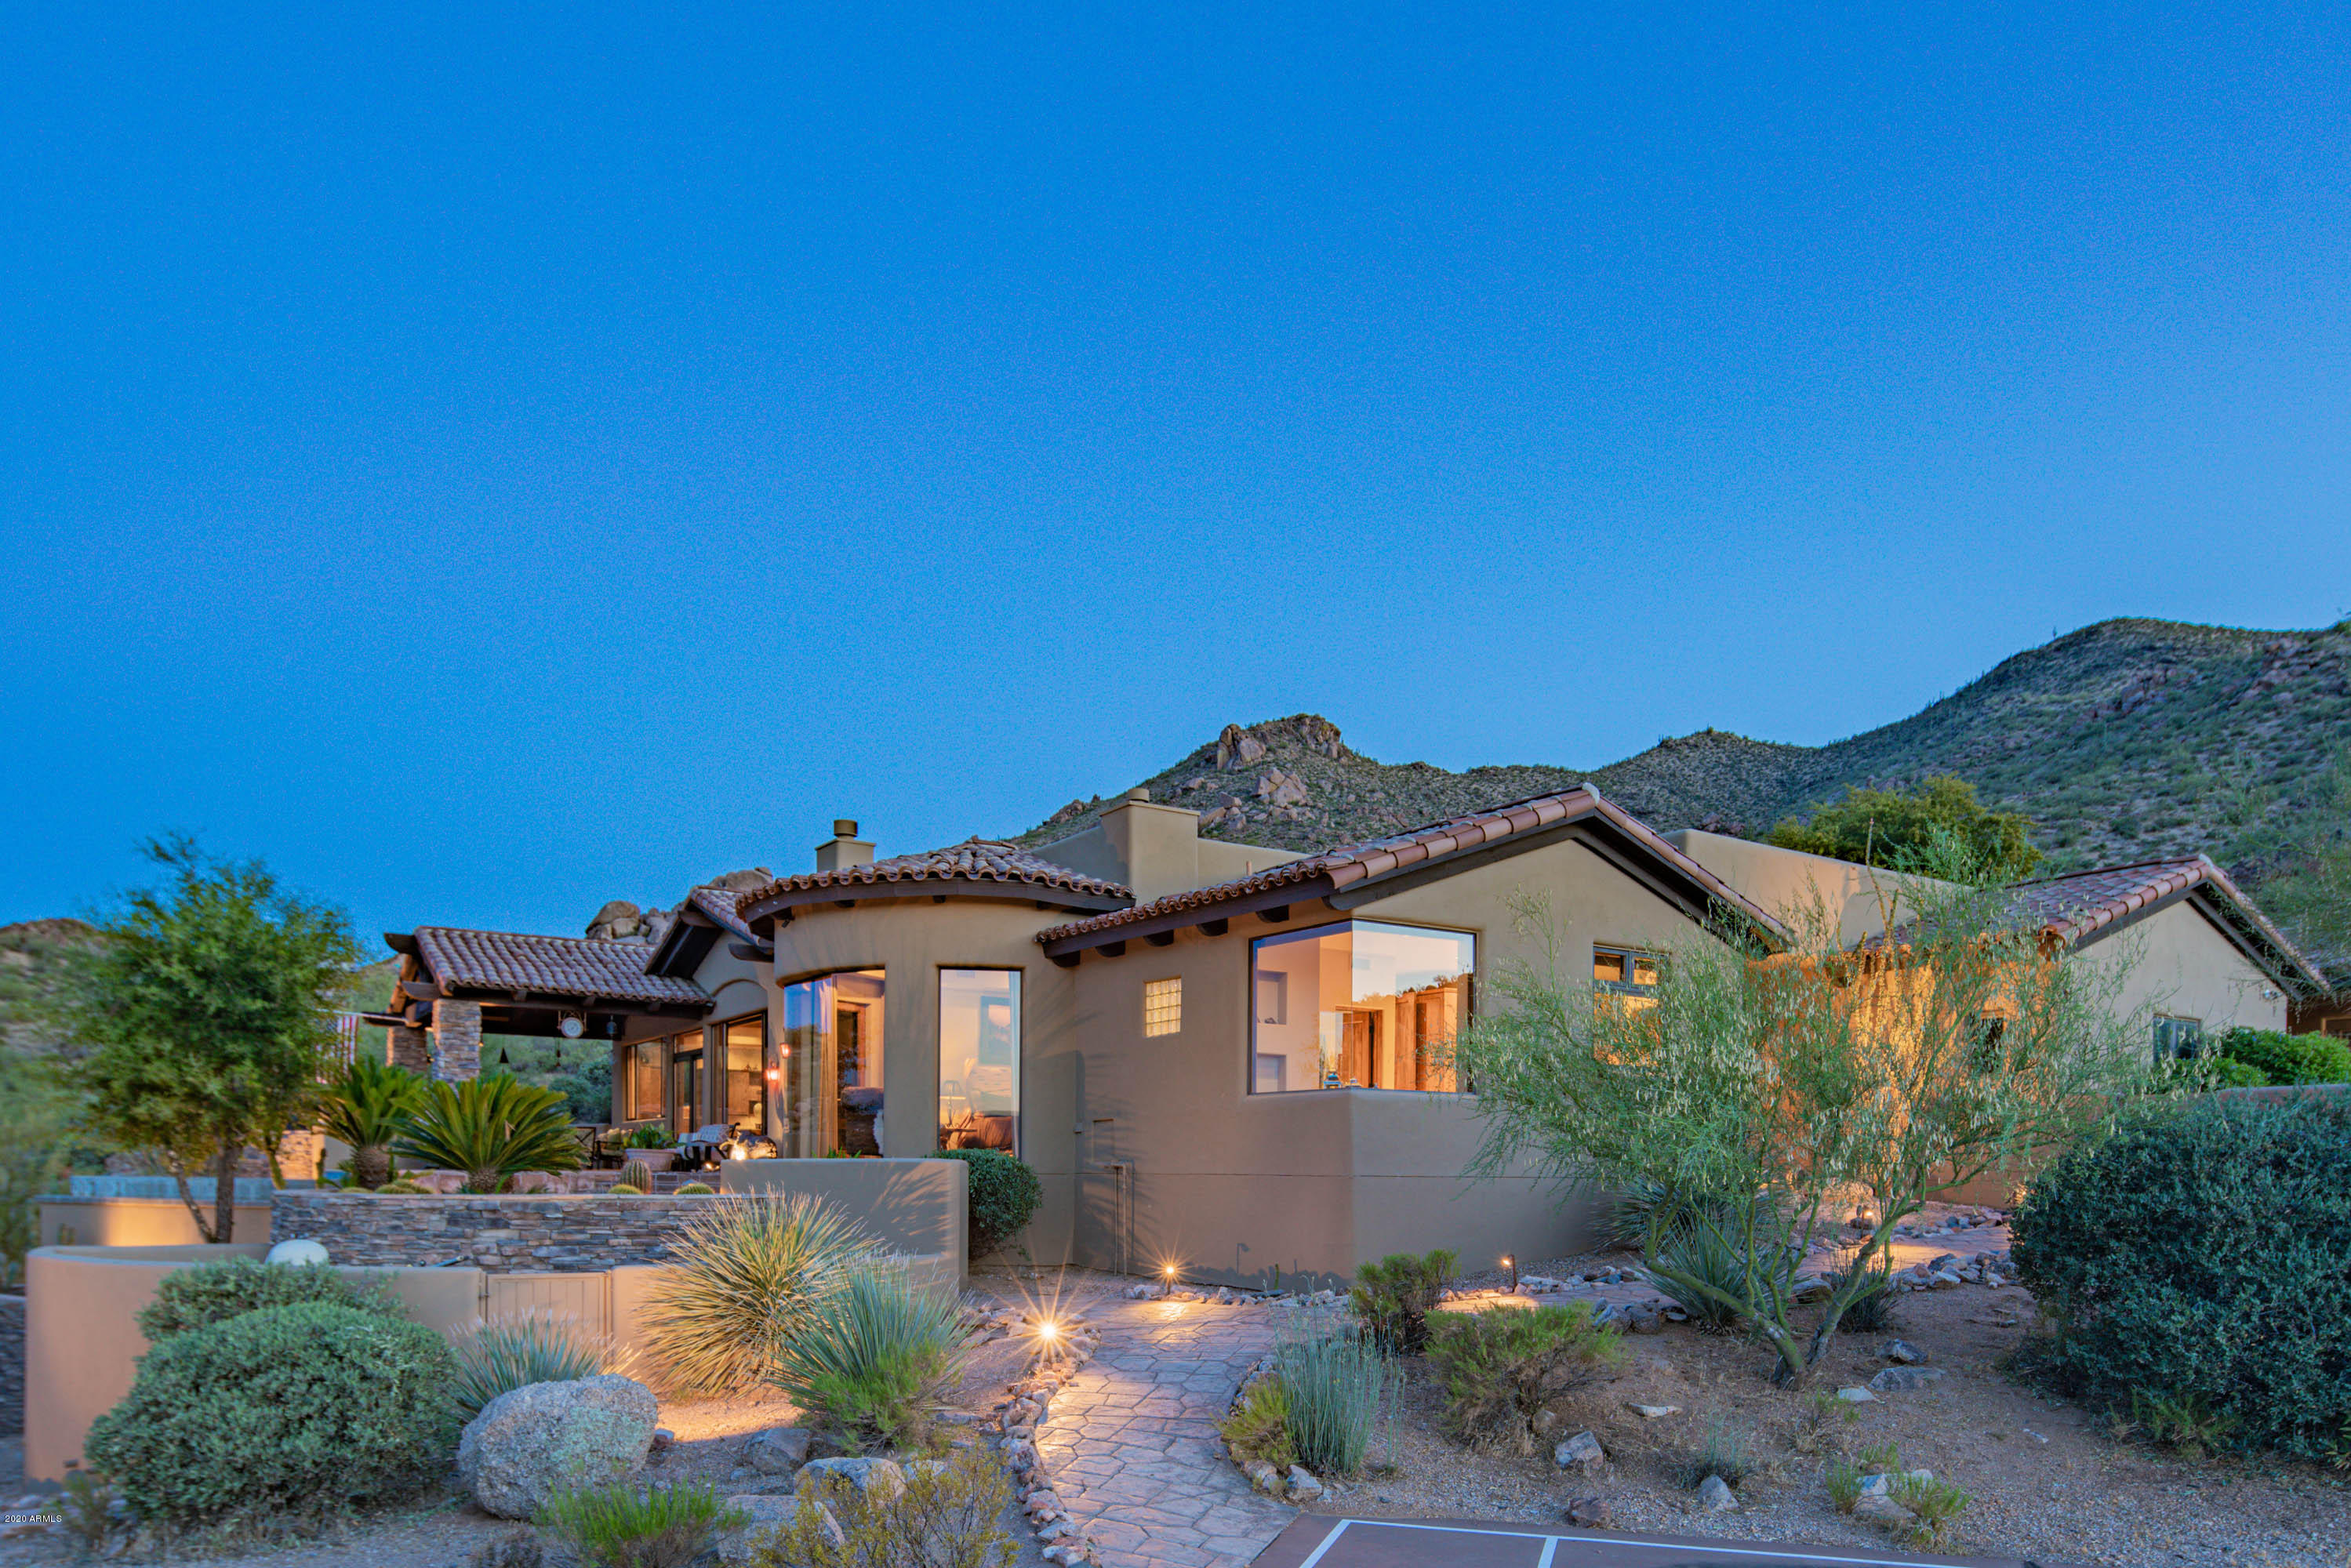 Photo of 37202 N NEVER MIND Trail, Carefree, AZ 85377